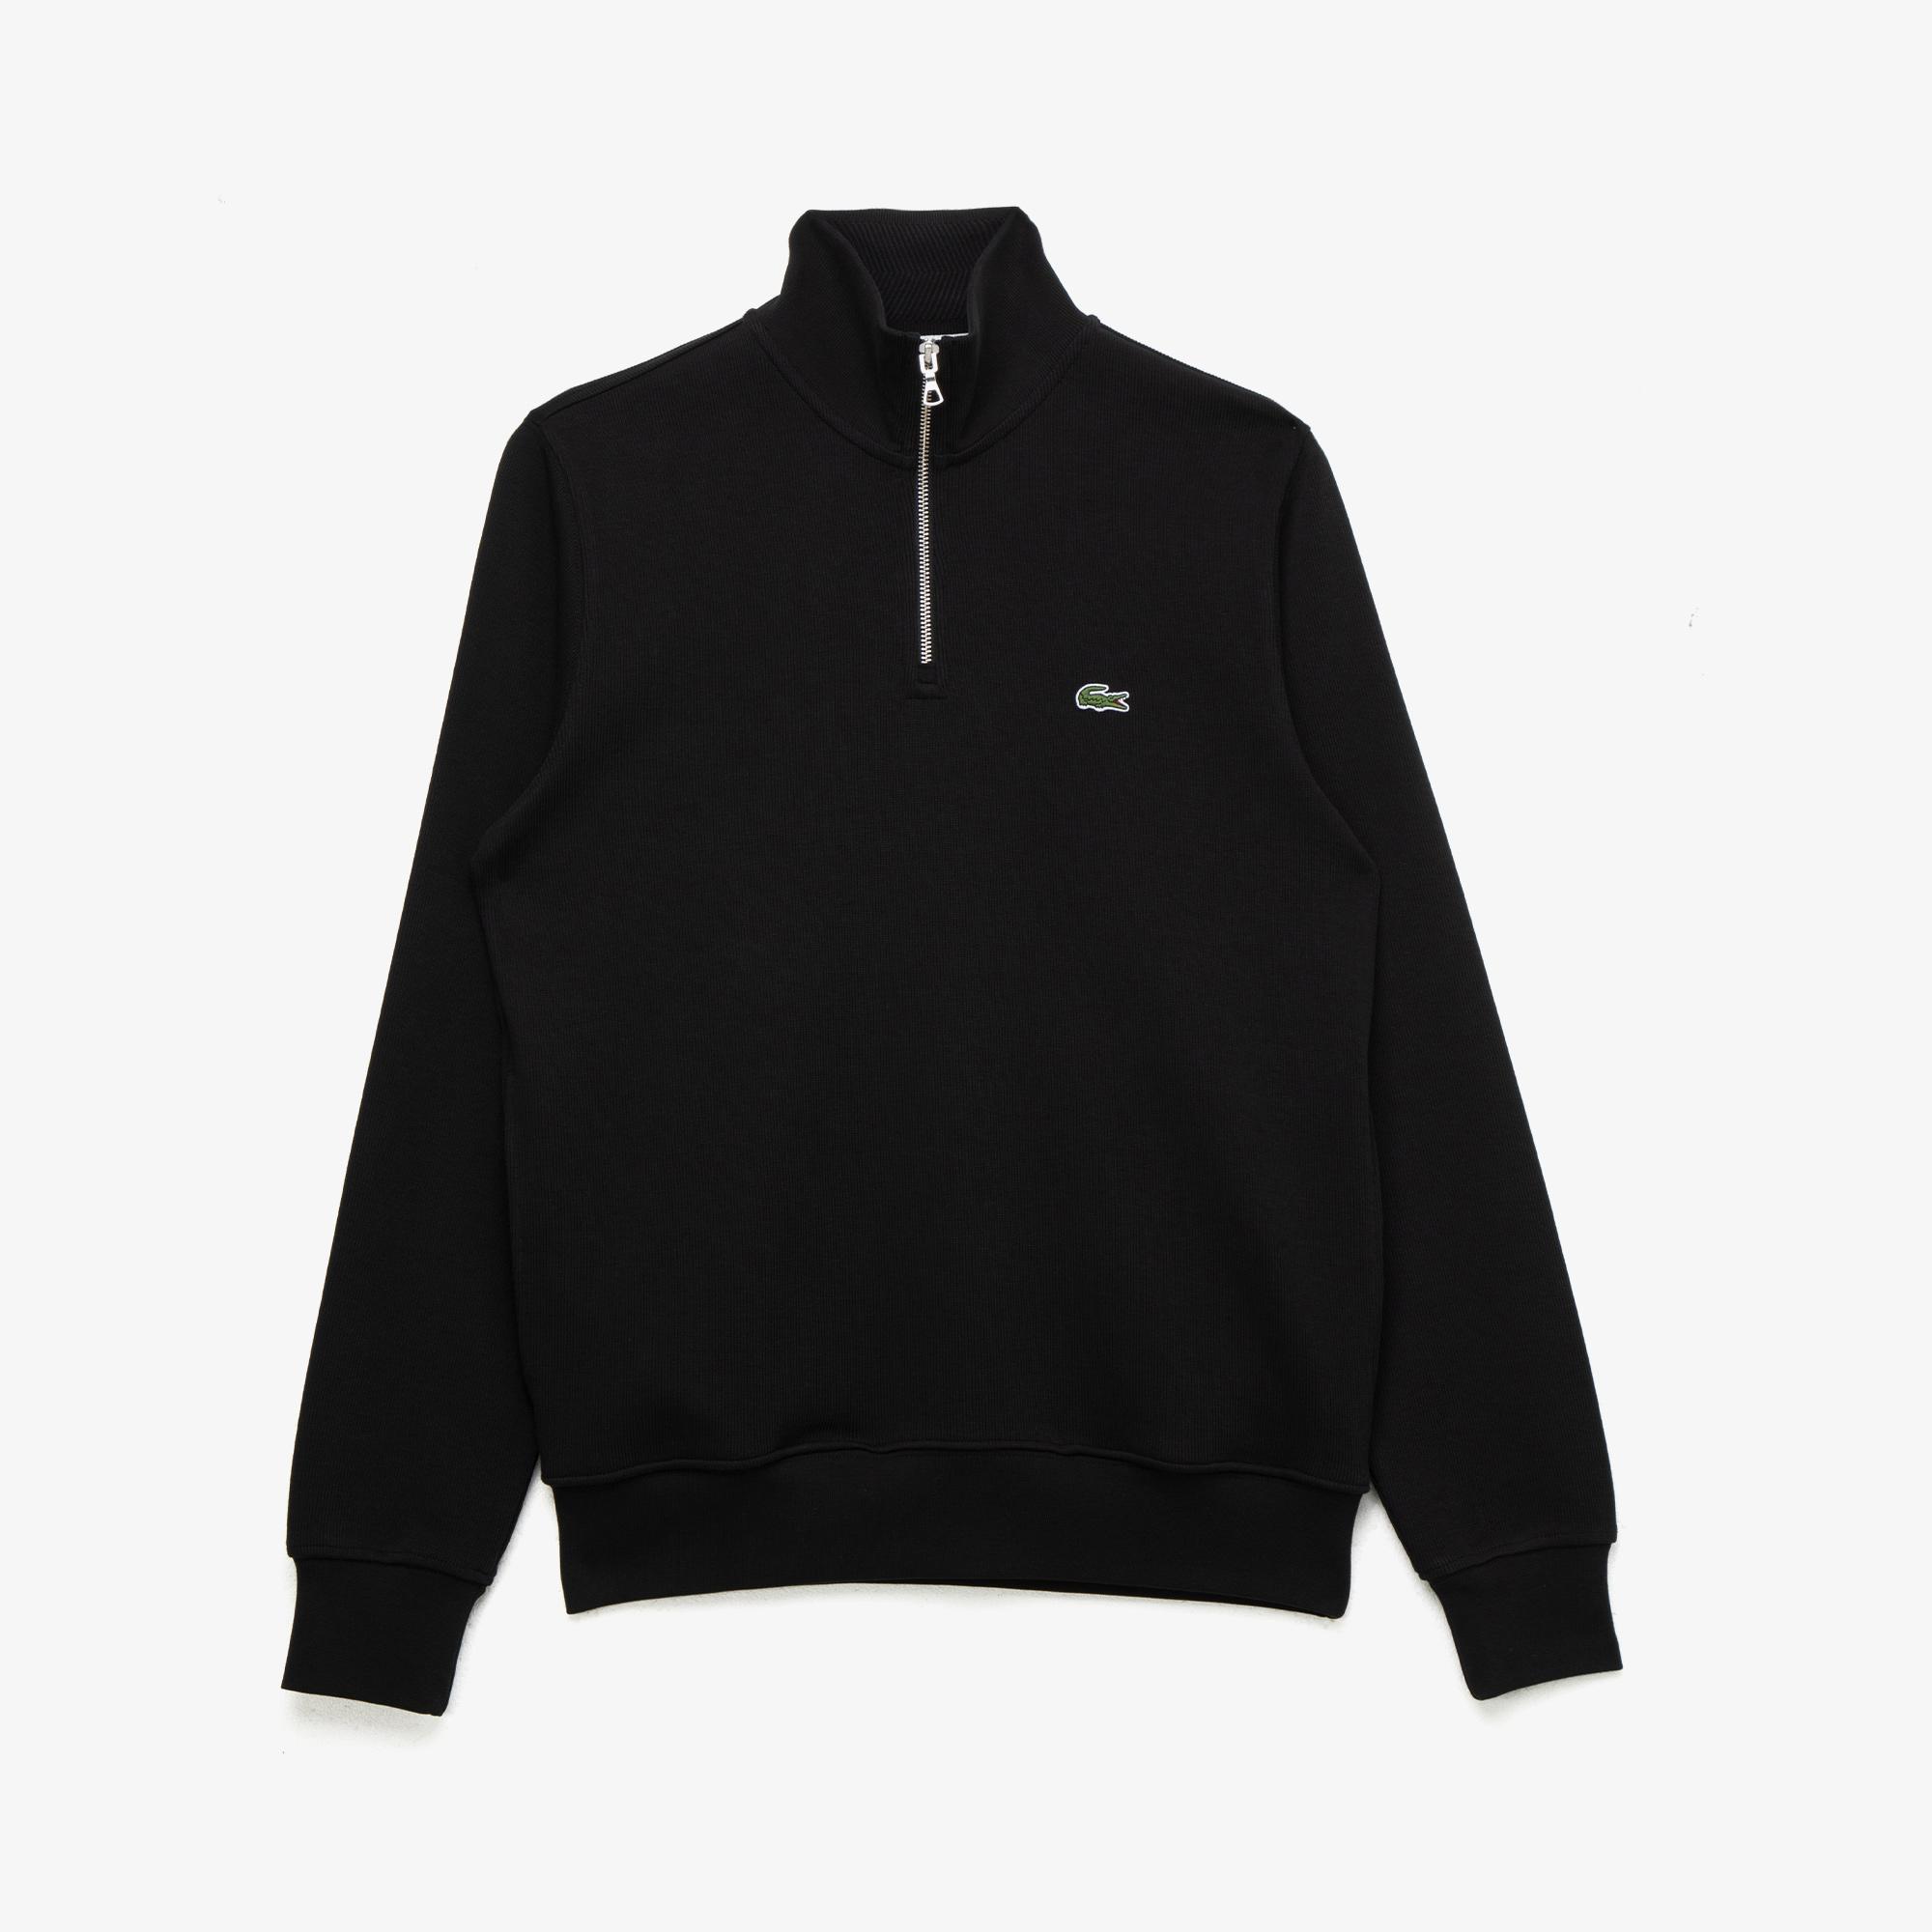 Lacoste Erkek Fermuarlı Yaka Siyah Sweatshirt